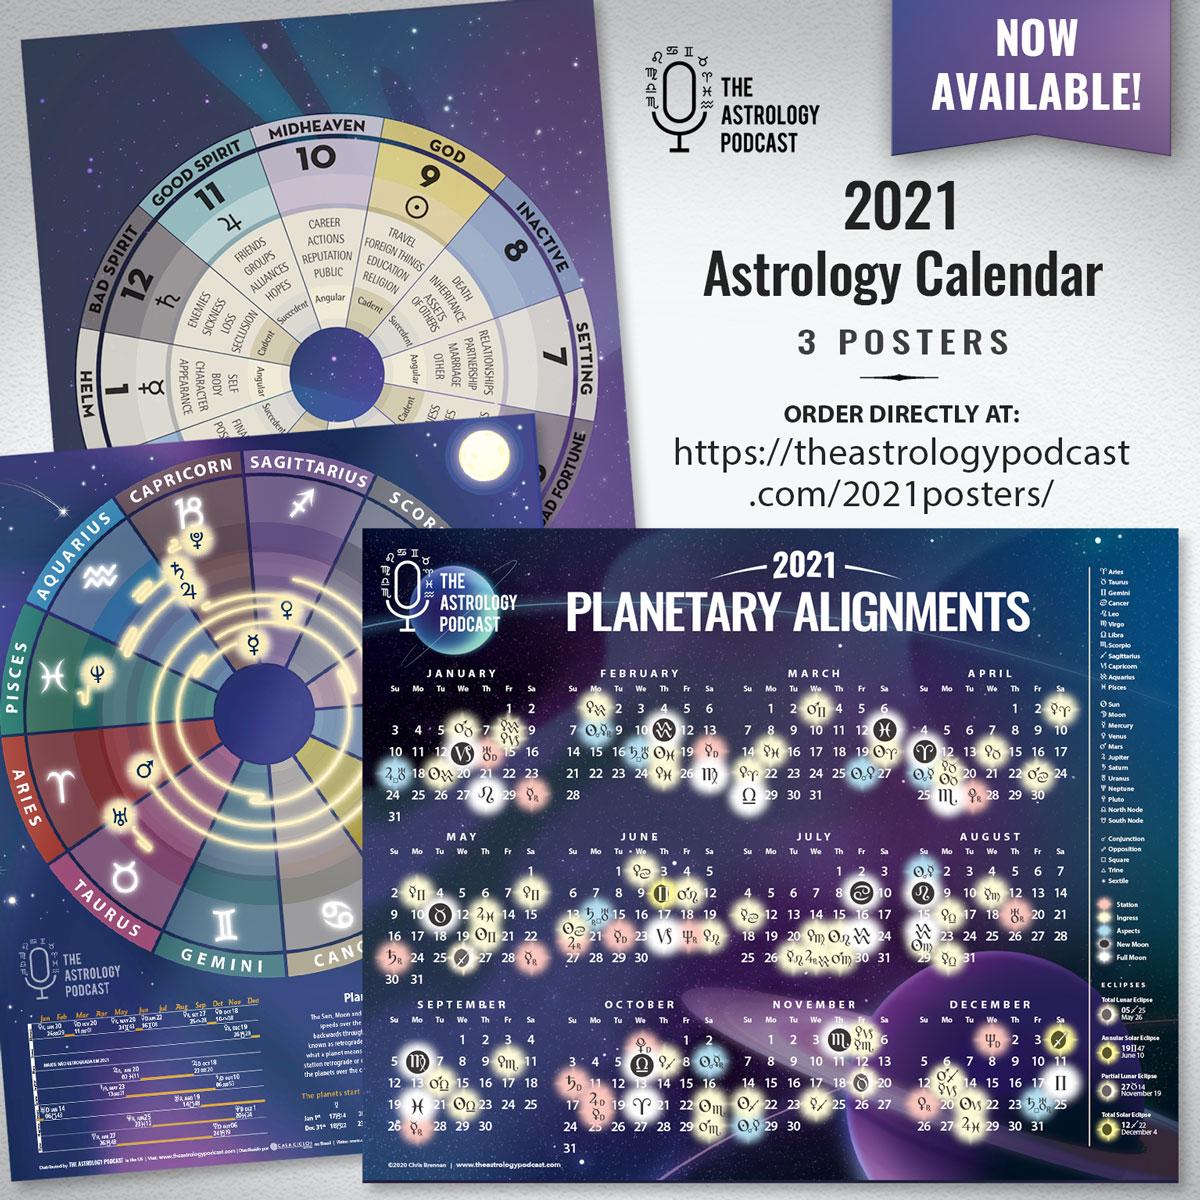 2021 Astrology Calendar Posters